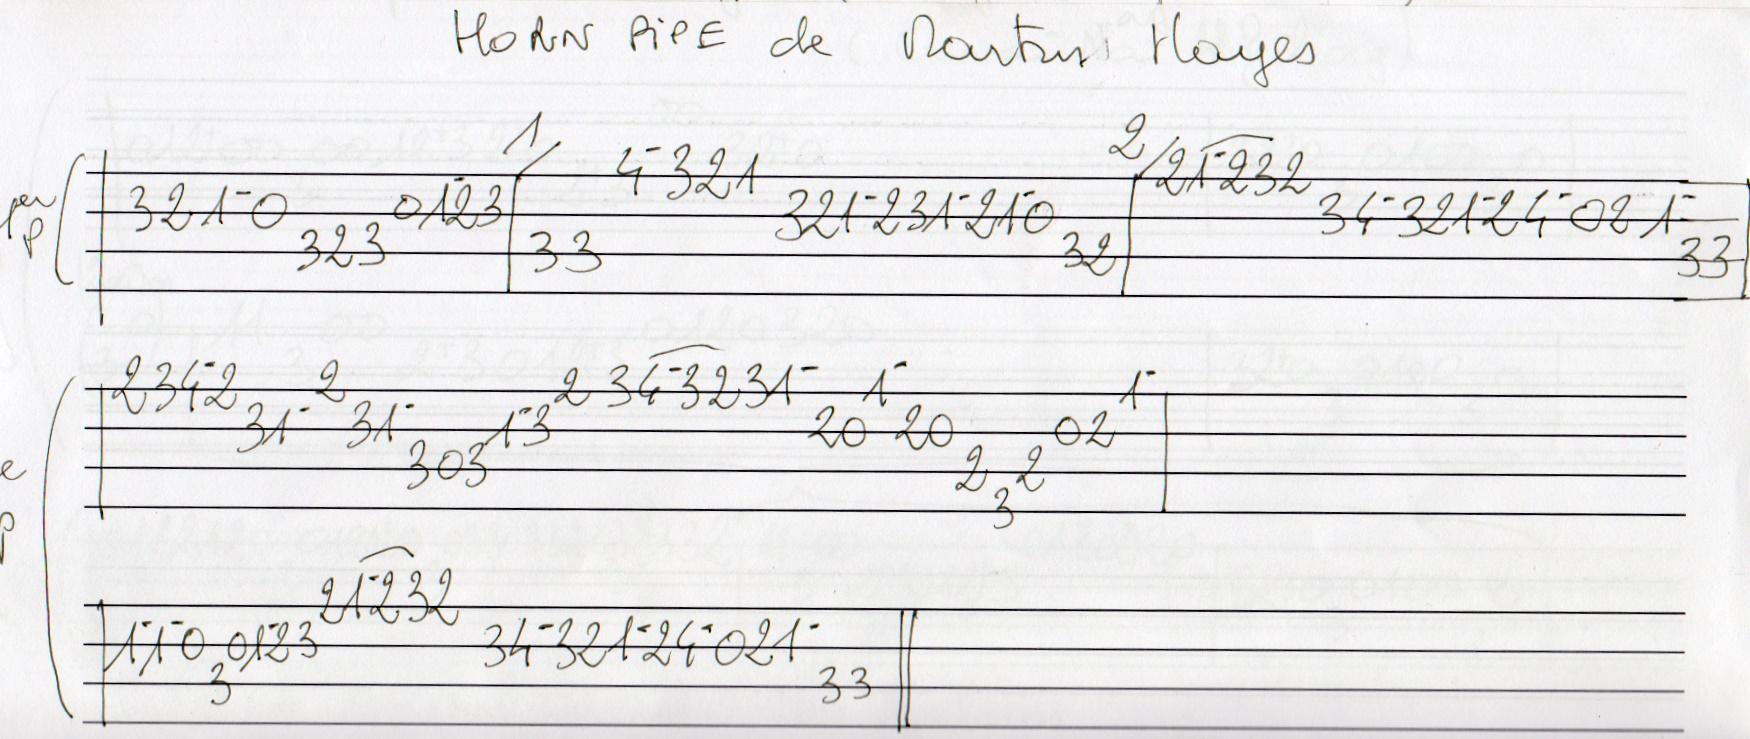 Un horn pipe de Martin Hayes